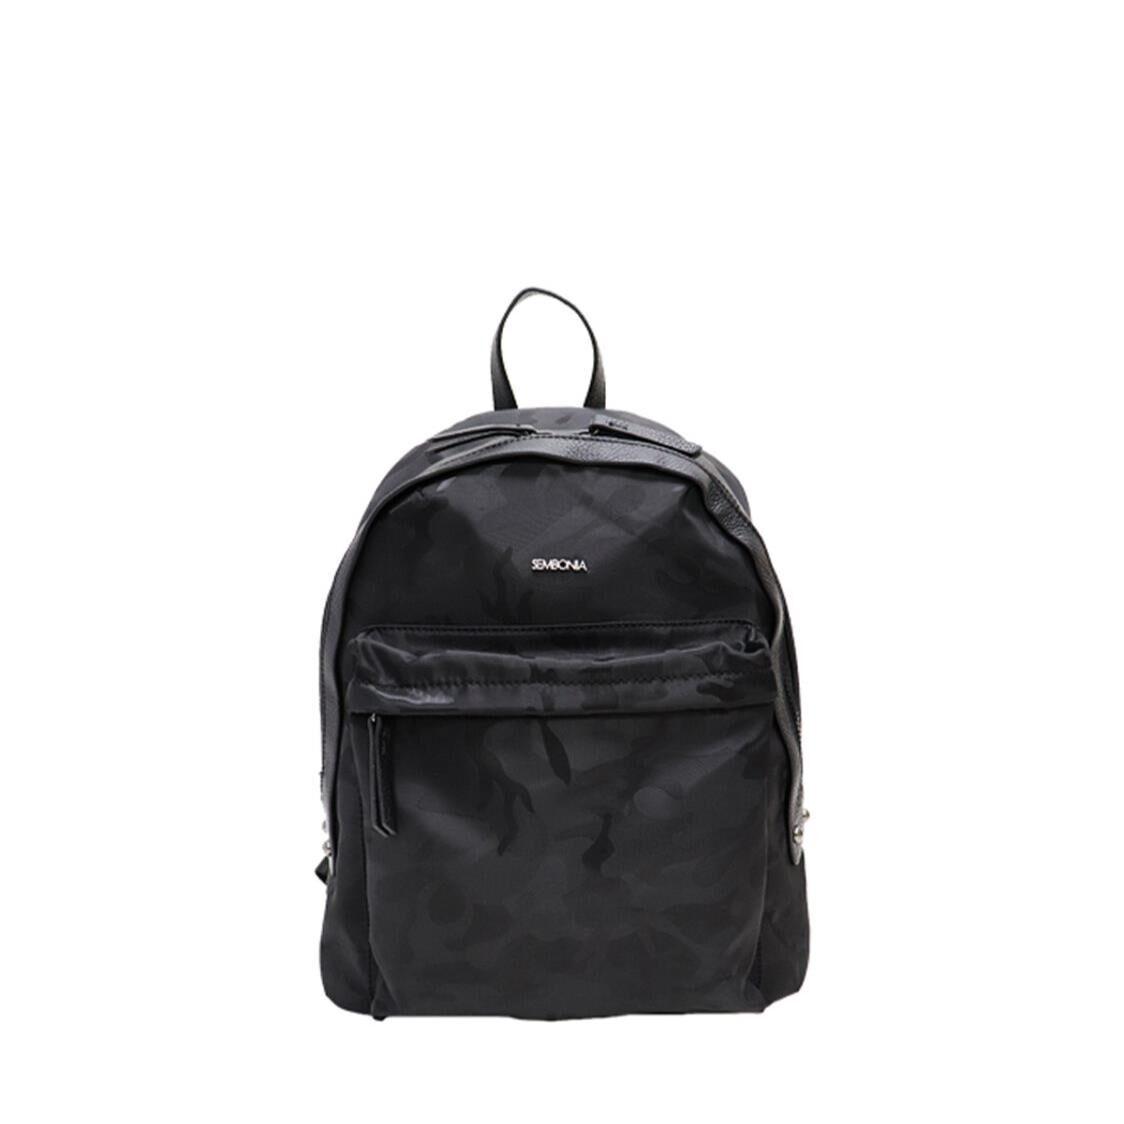 Sembonia Nylon Trim Leather Backpack Black 62351-123-08